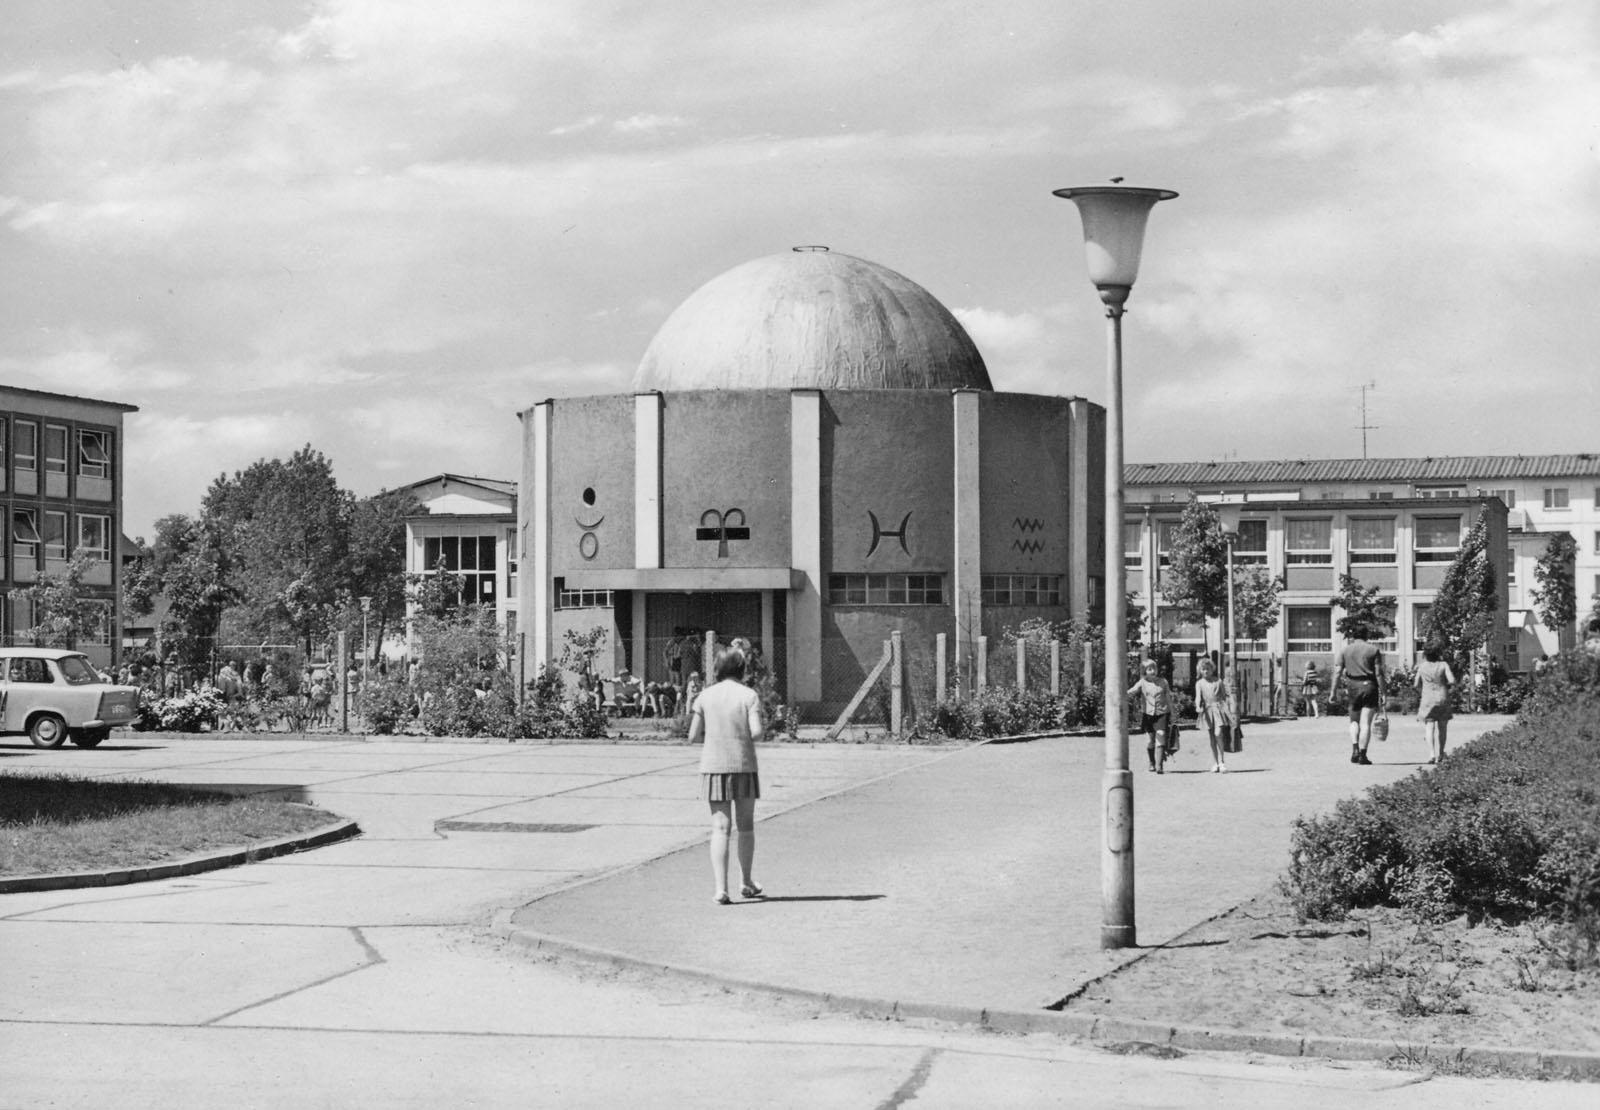 Wohnkomplex VI um 1970